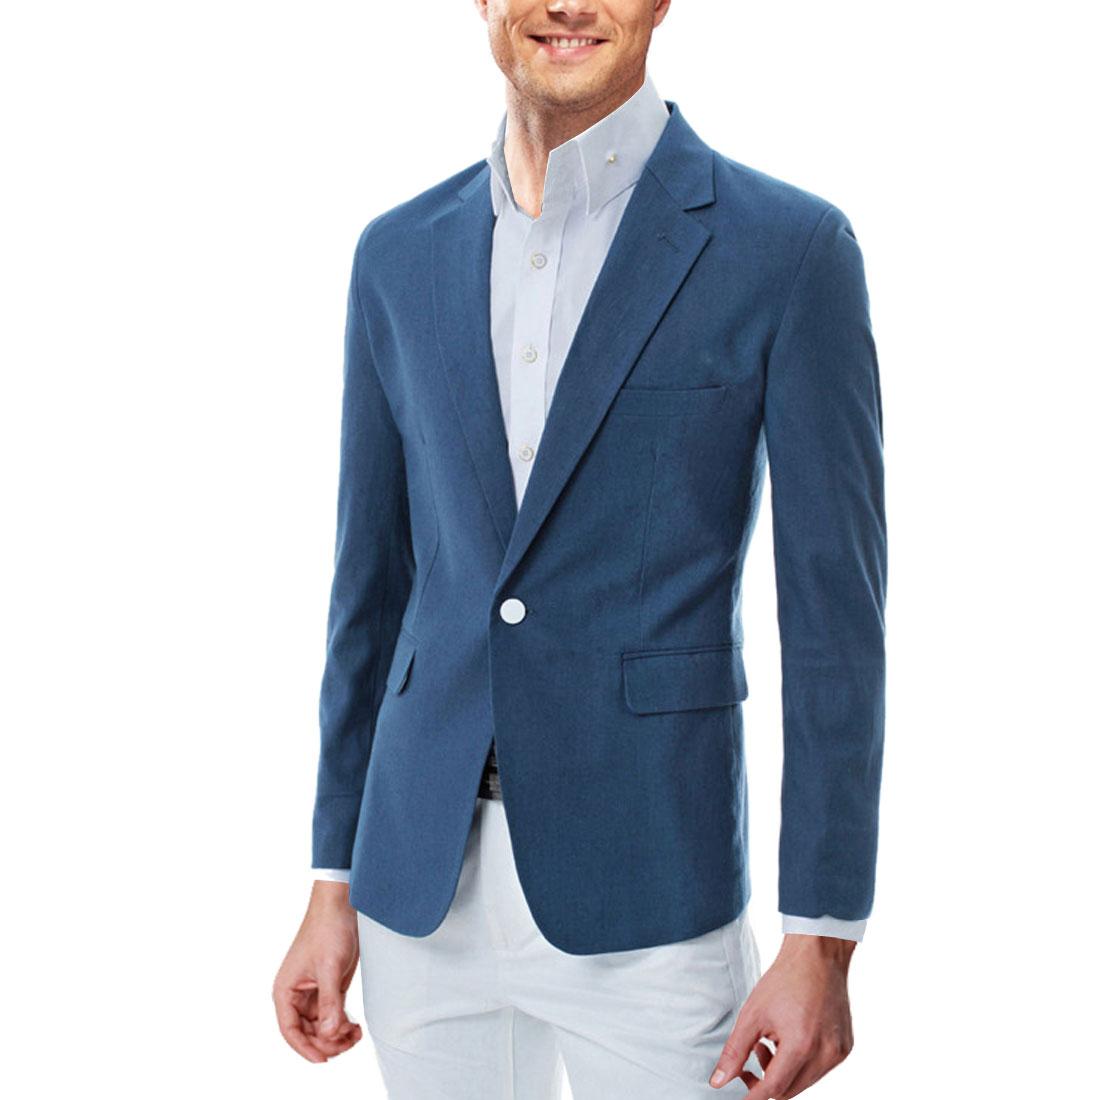 Men Long Sleeve Fake Chest Pocket Blazer Navy Blue M